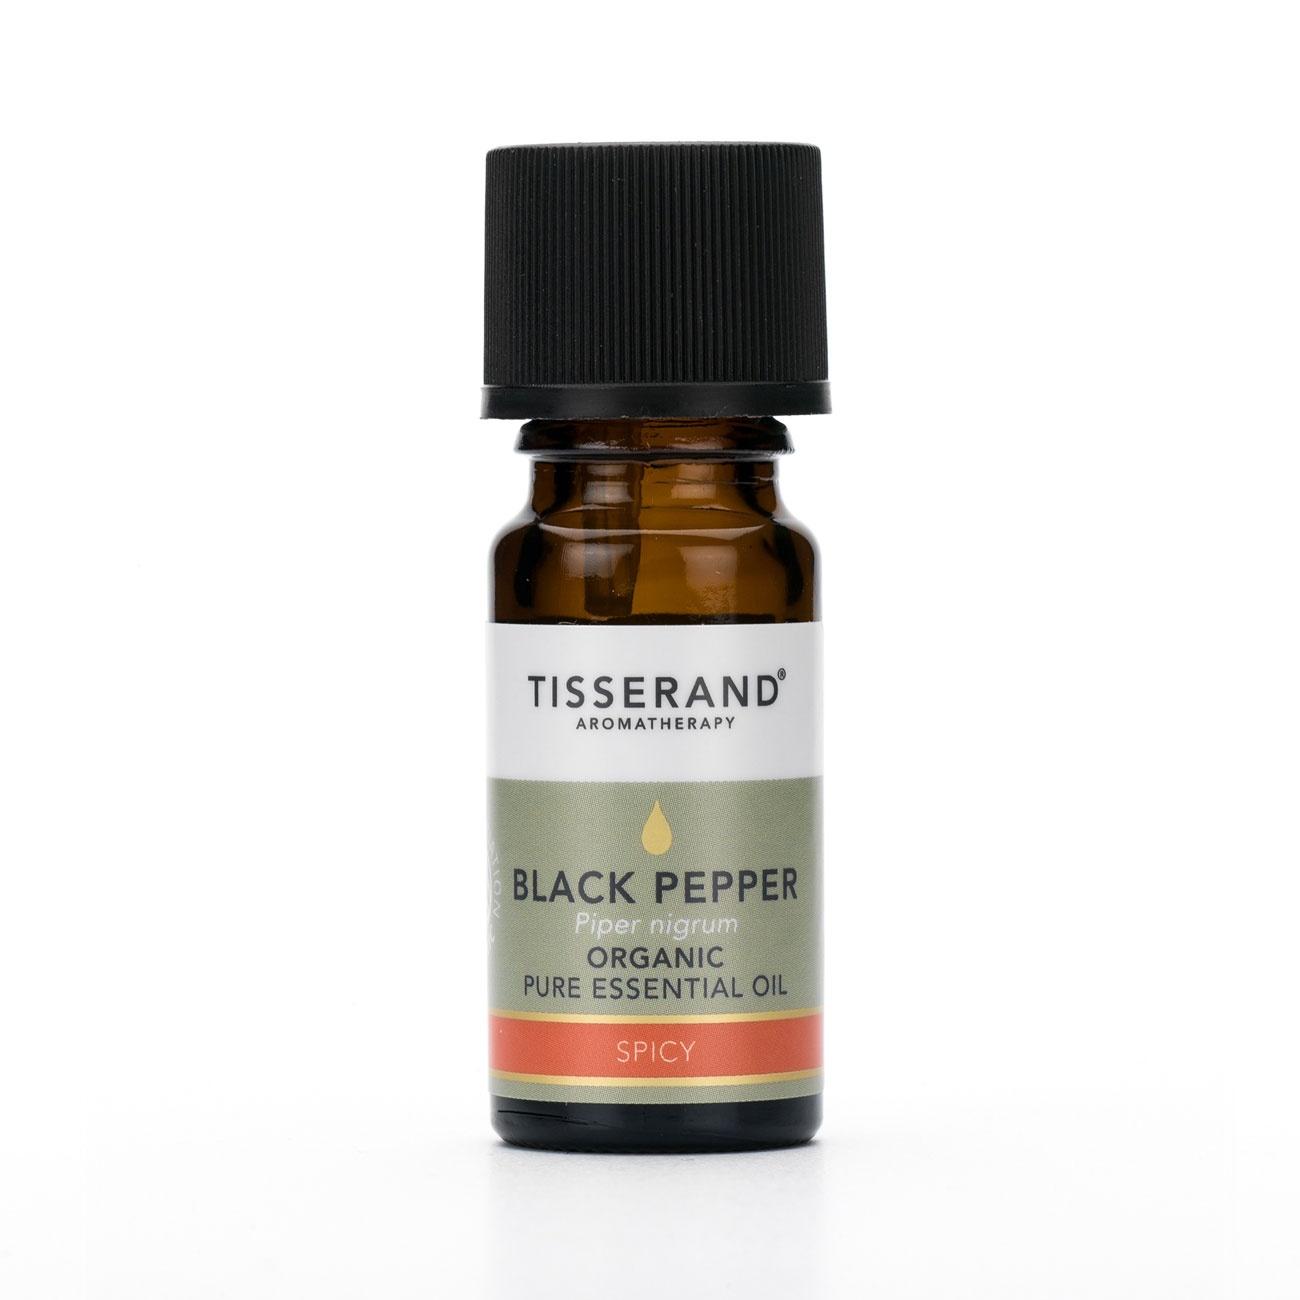 Tisserand Black Pepper Organic 9ml